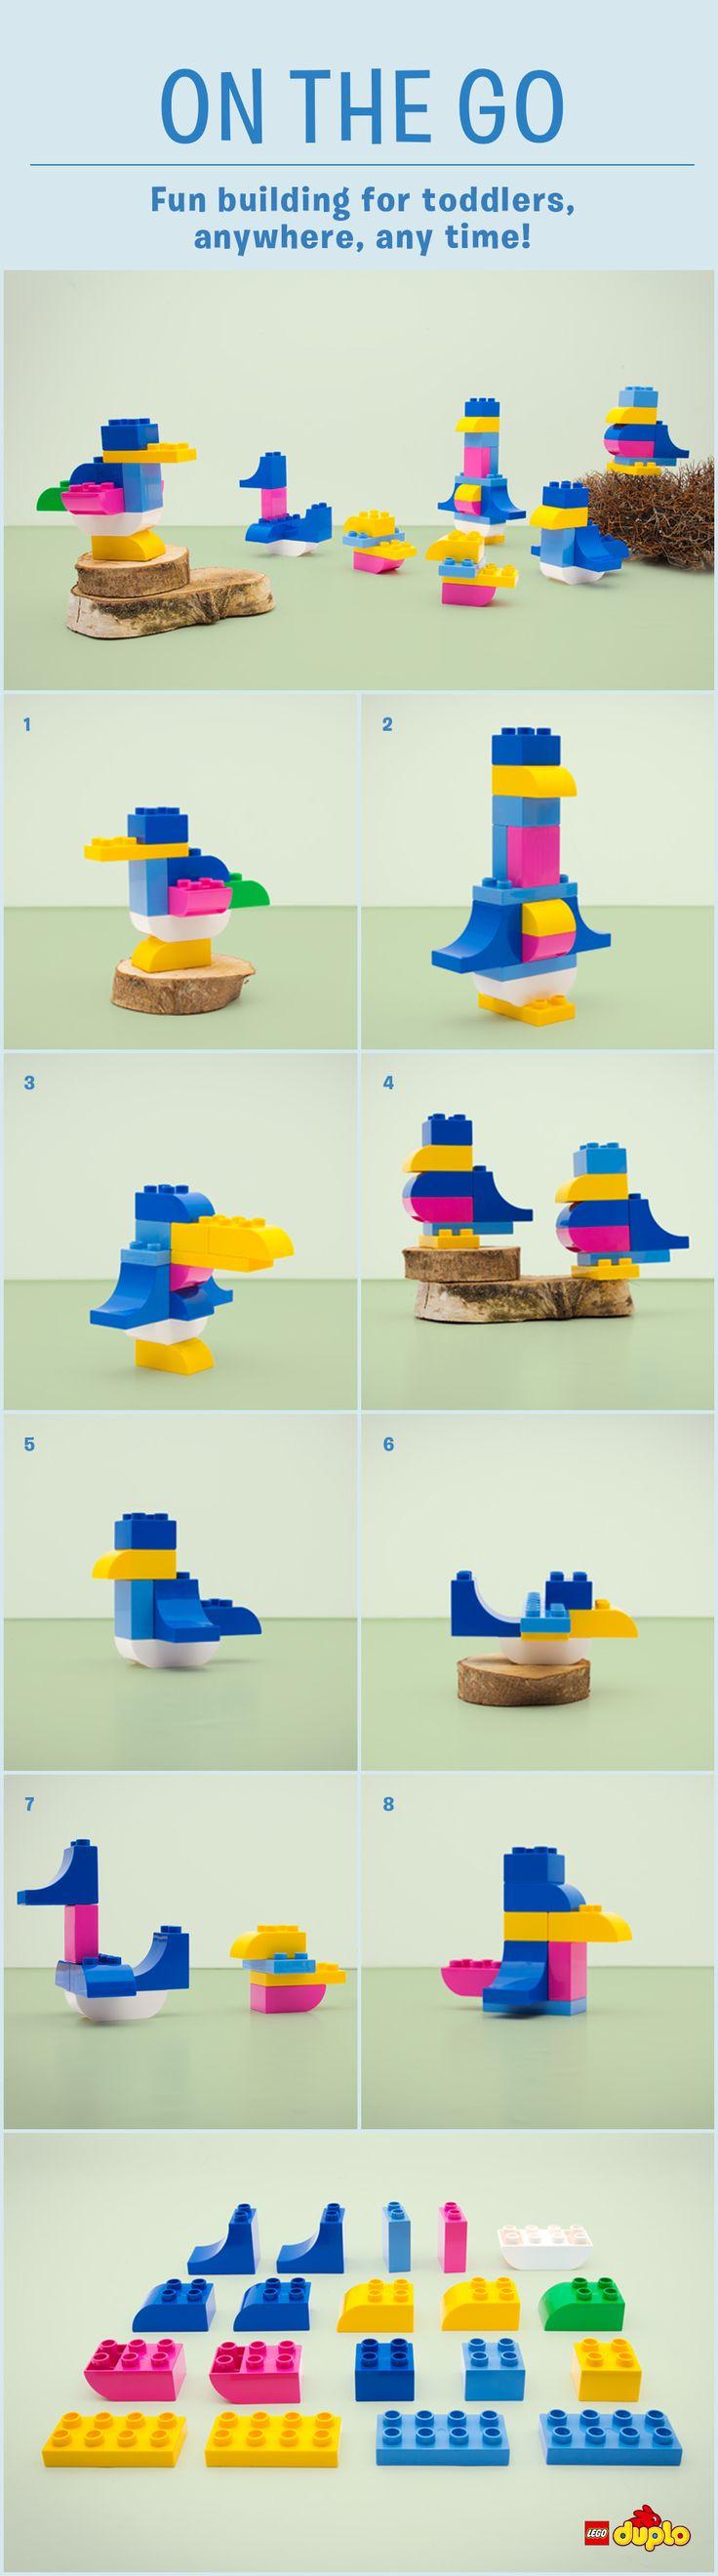 Best 25 Lego duplo ideas on Pinterest